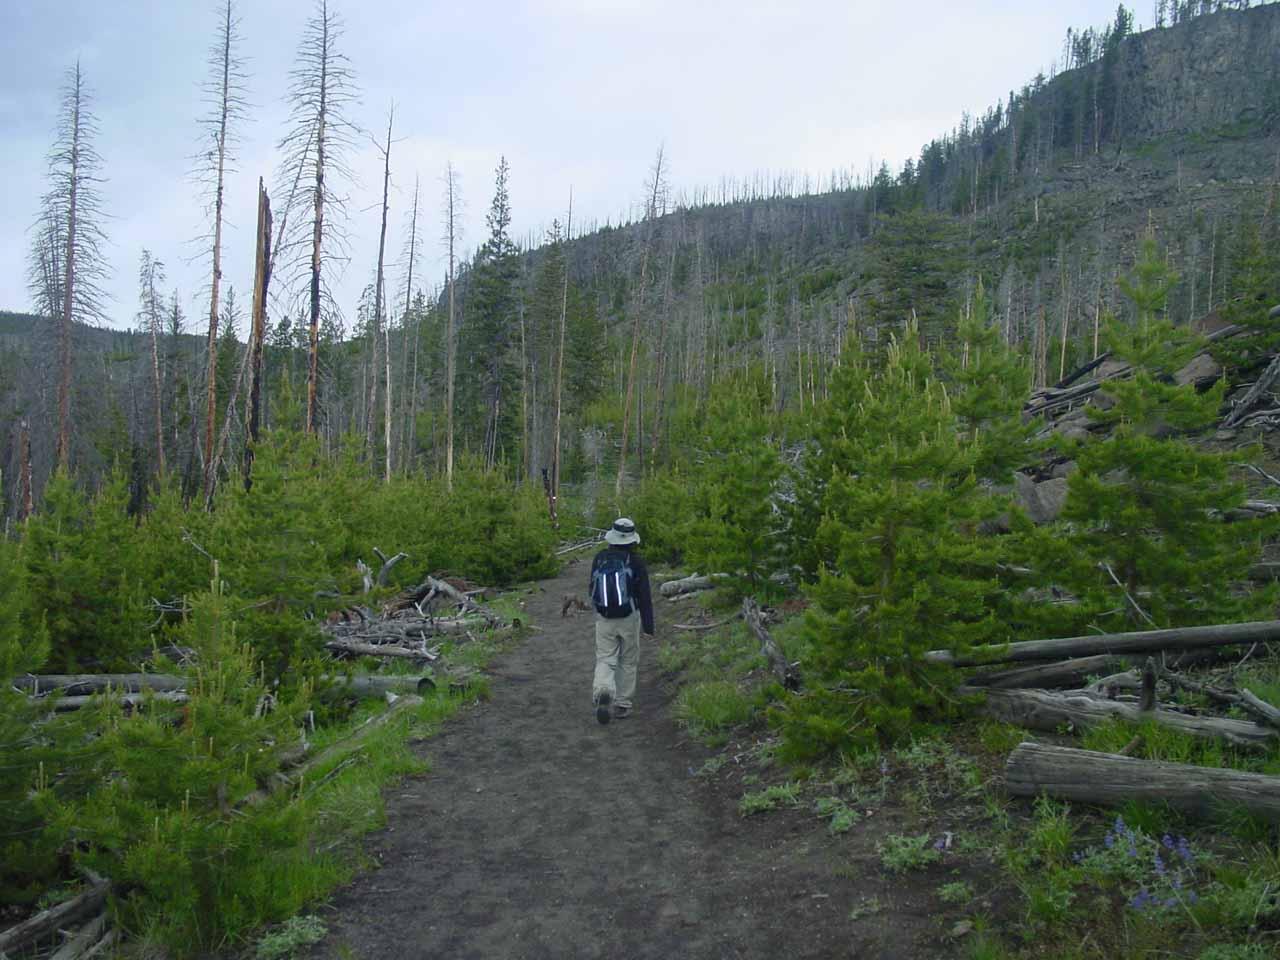 Julie on the Mystic Falls Trail